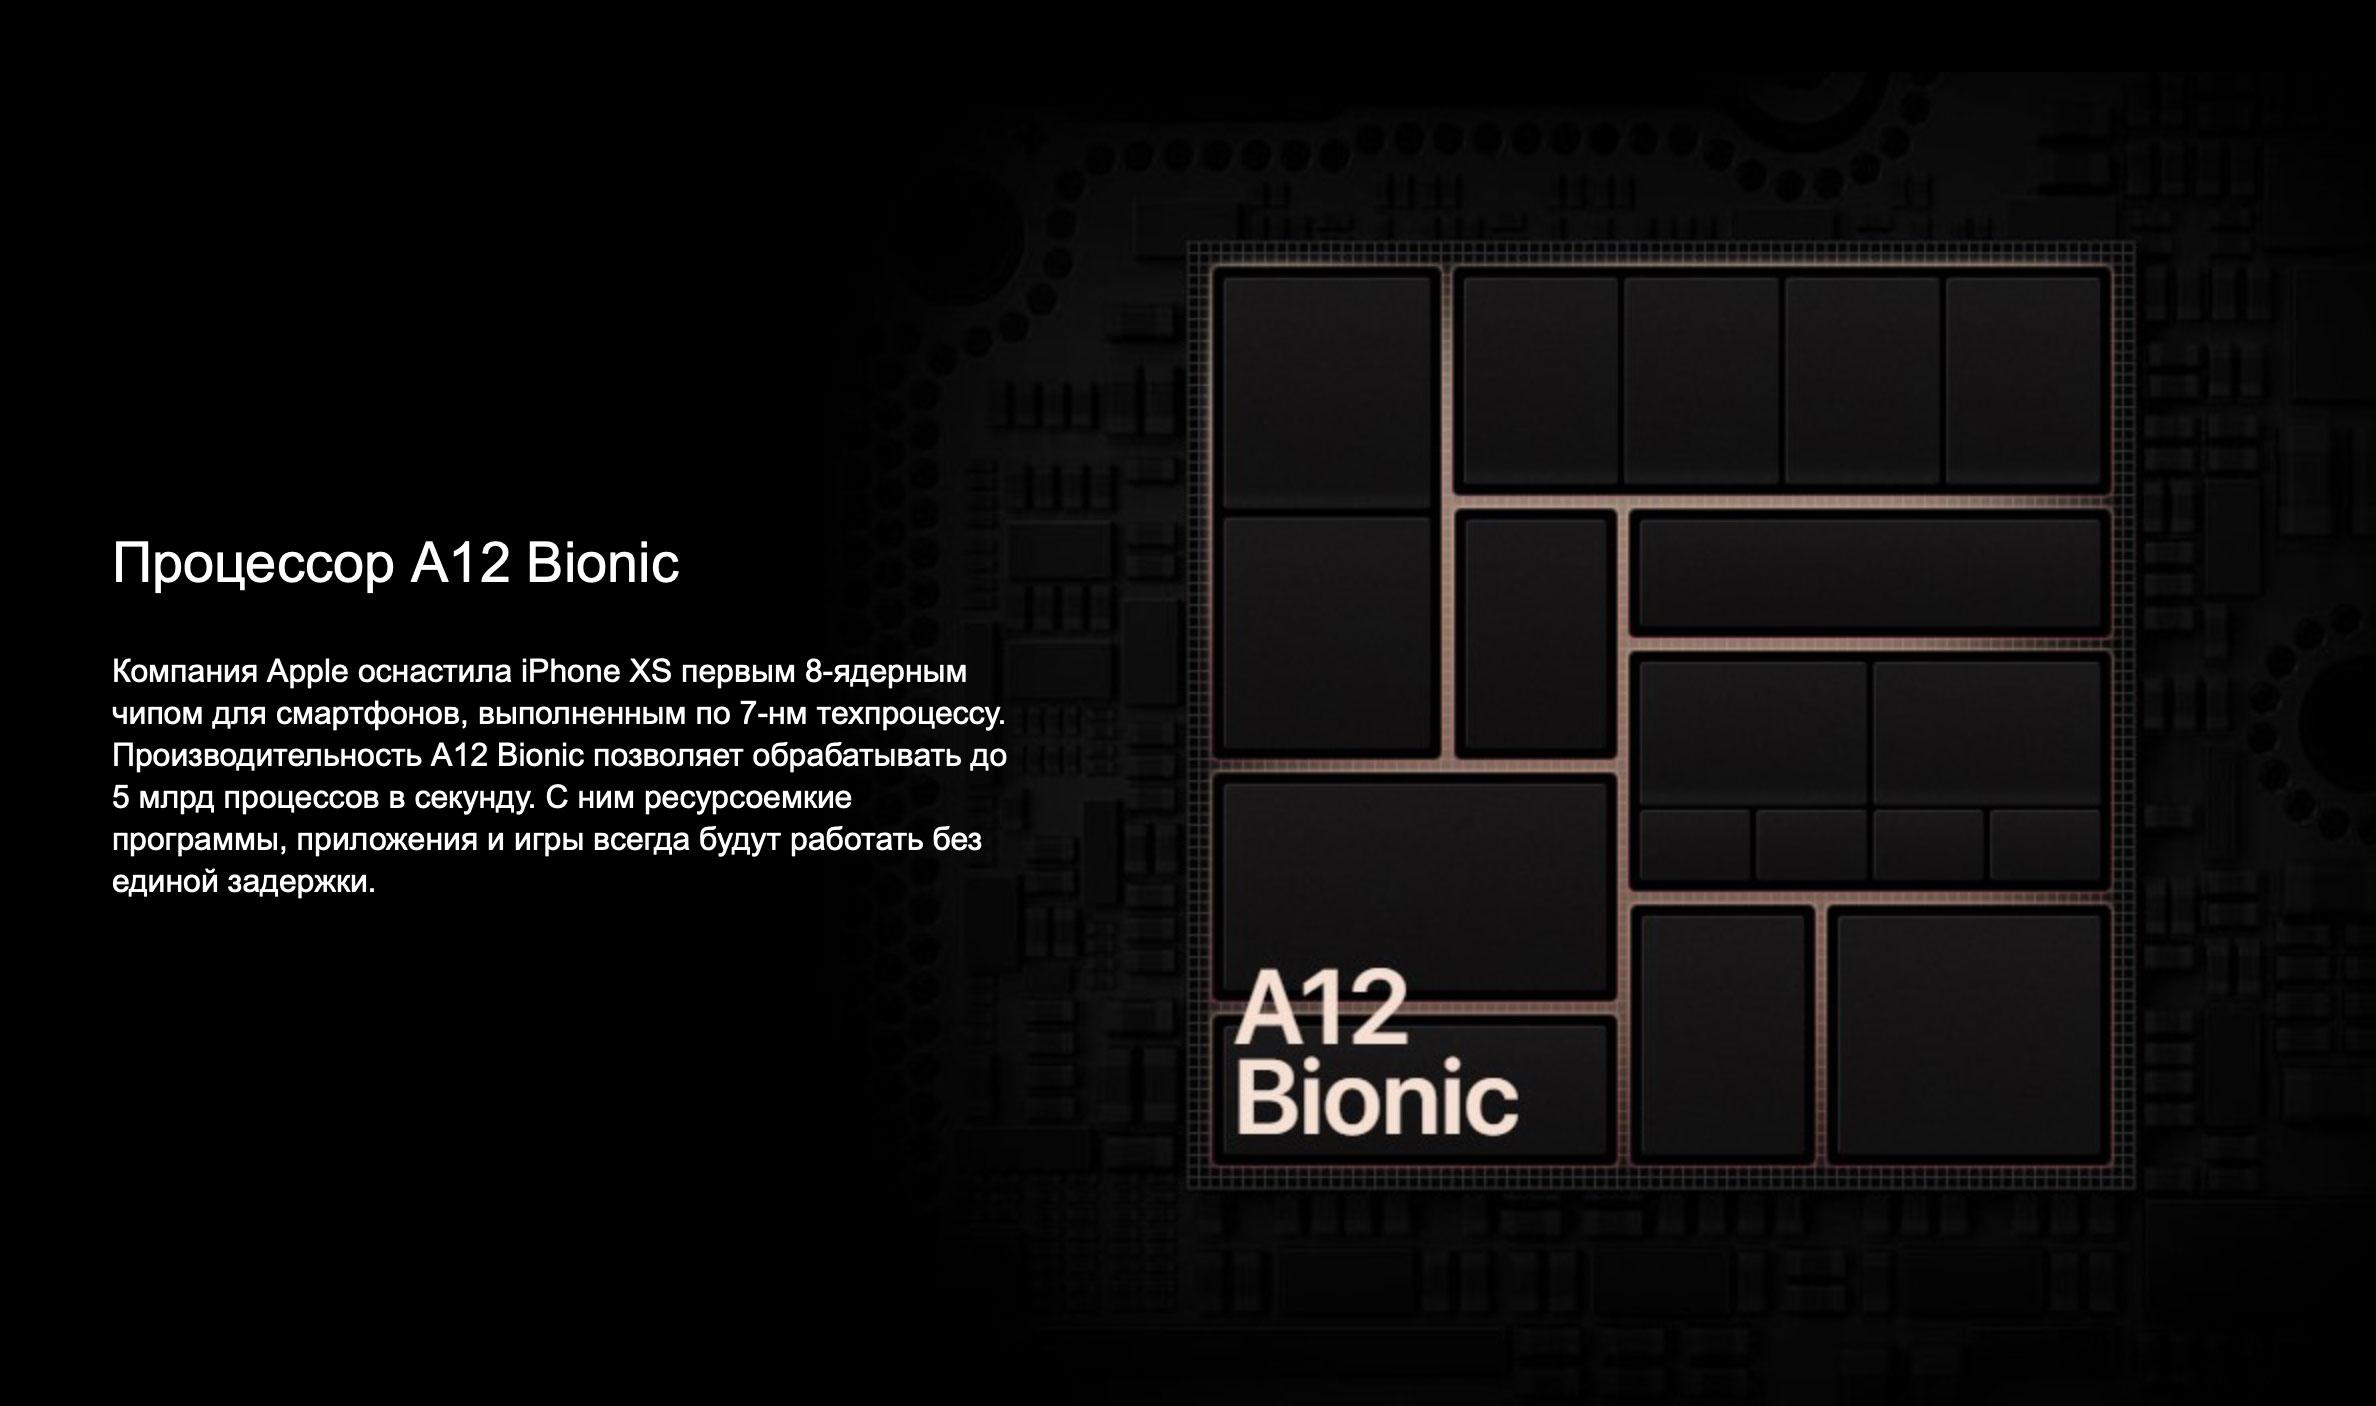 processor iPhone Xs